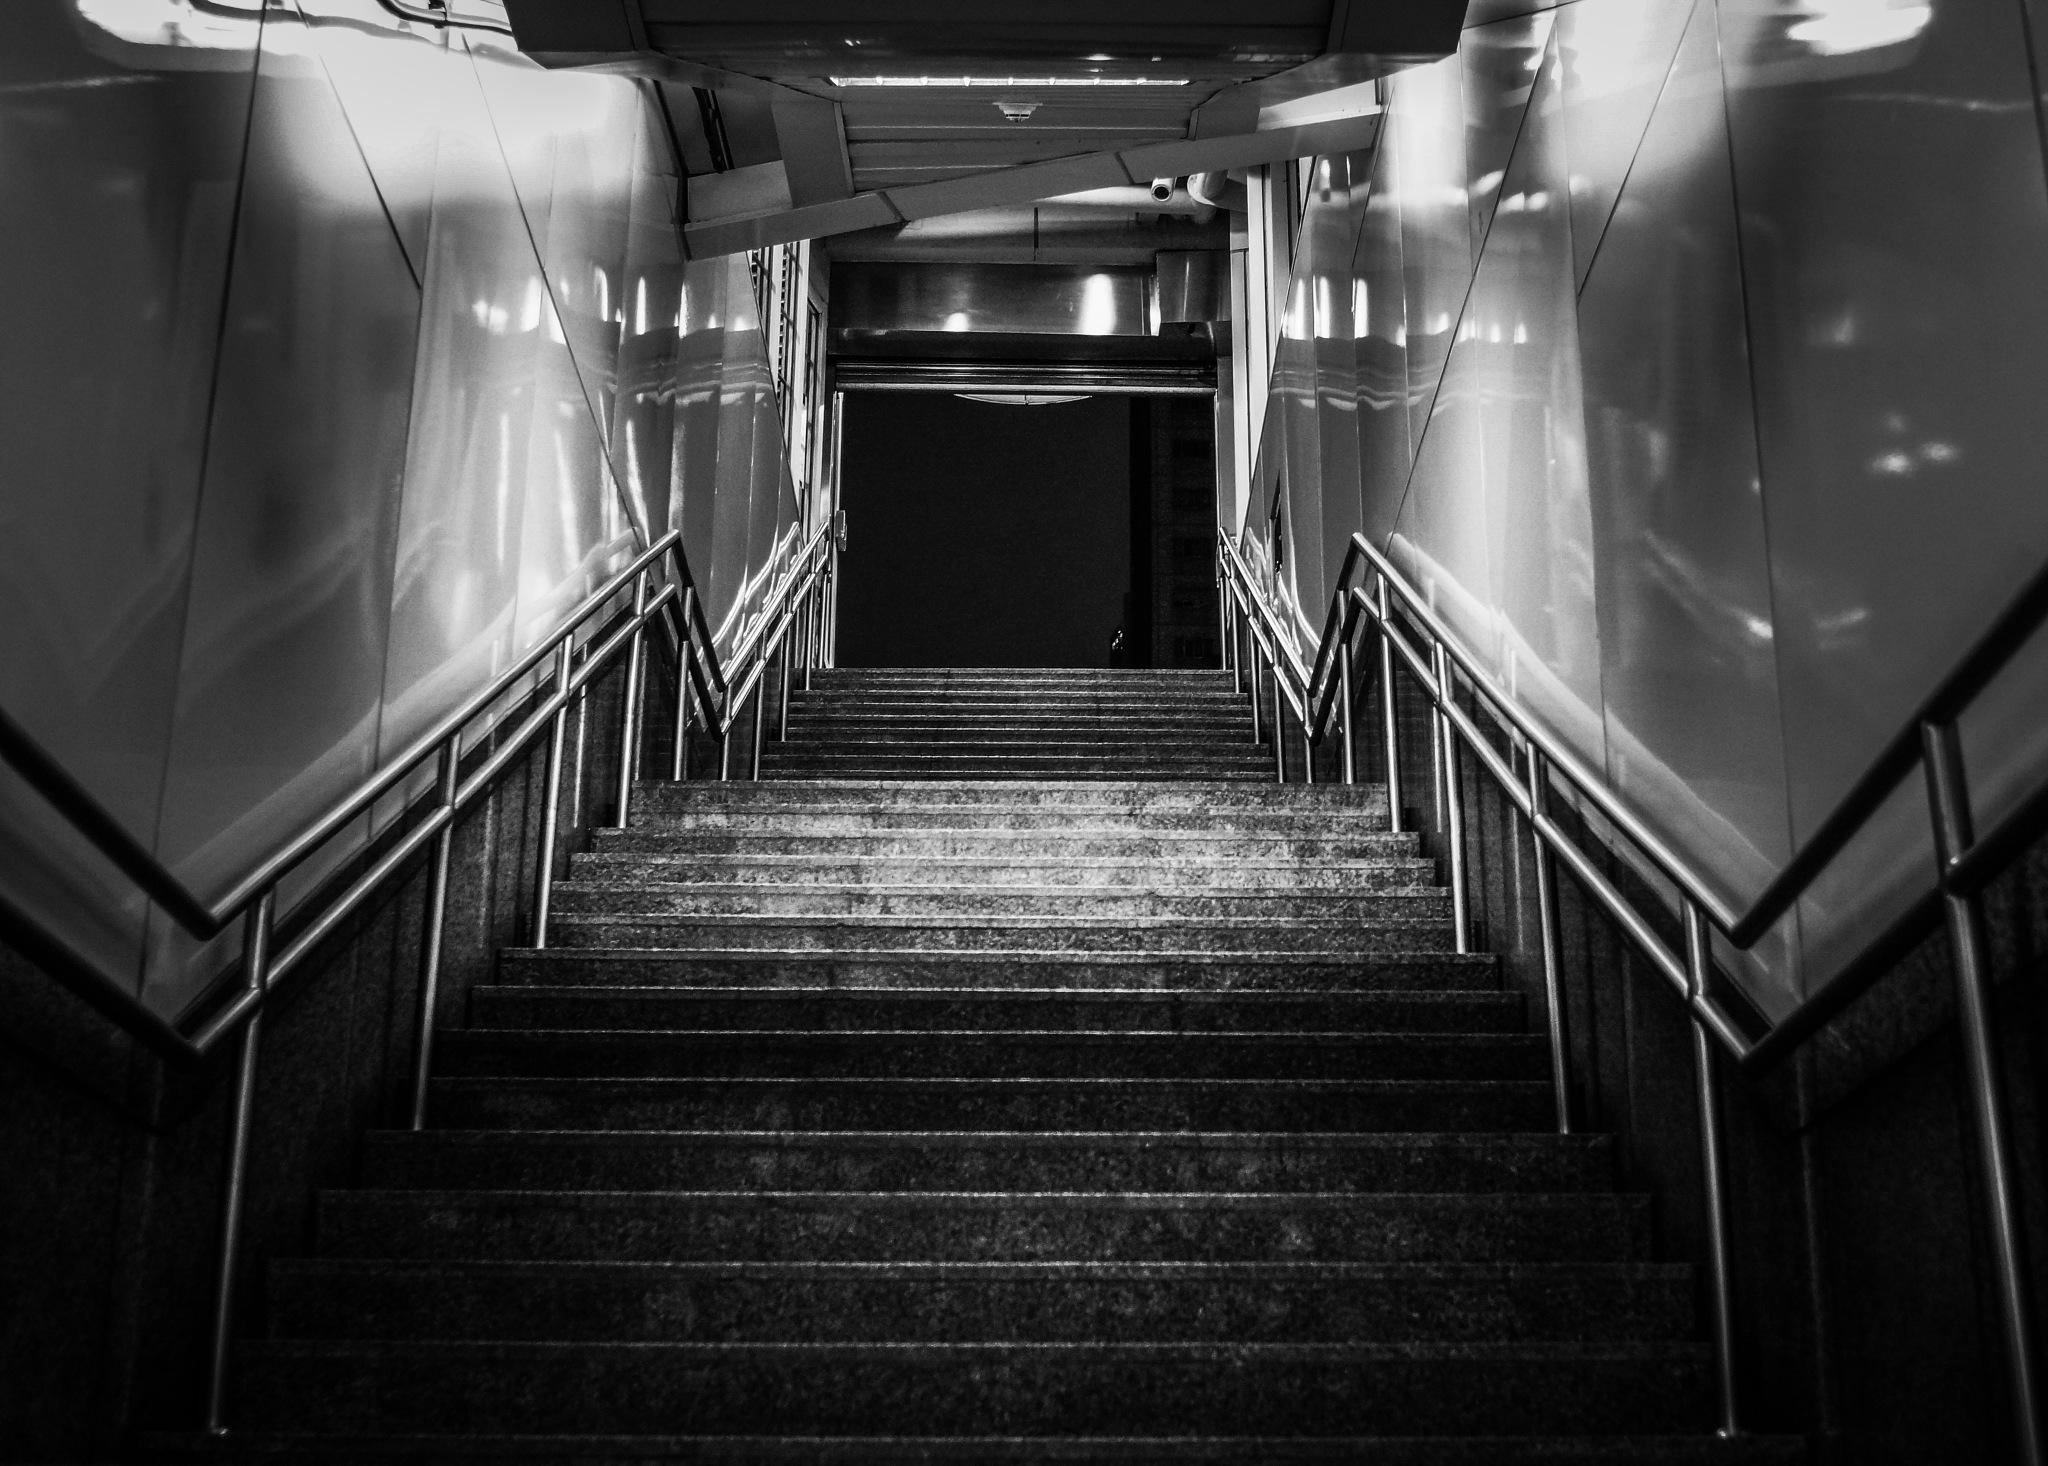 stair by Hongen Lin